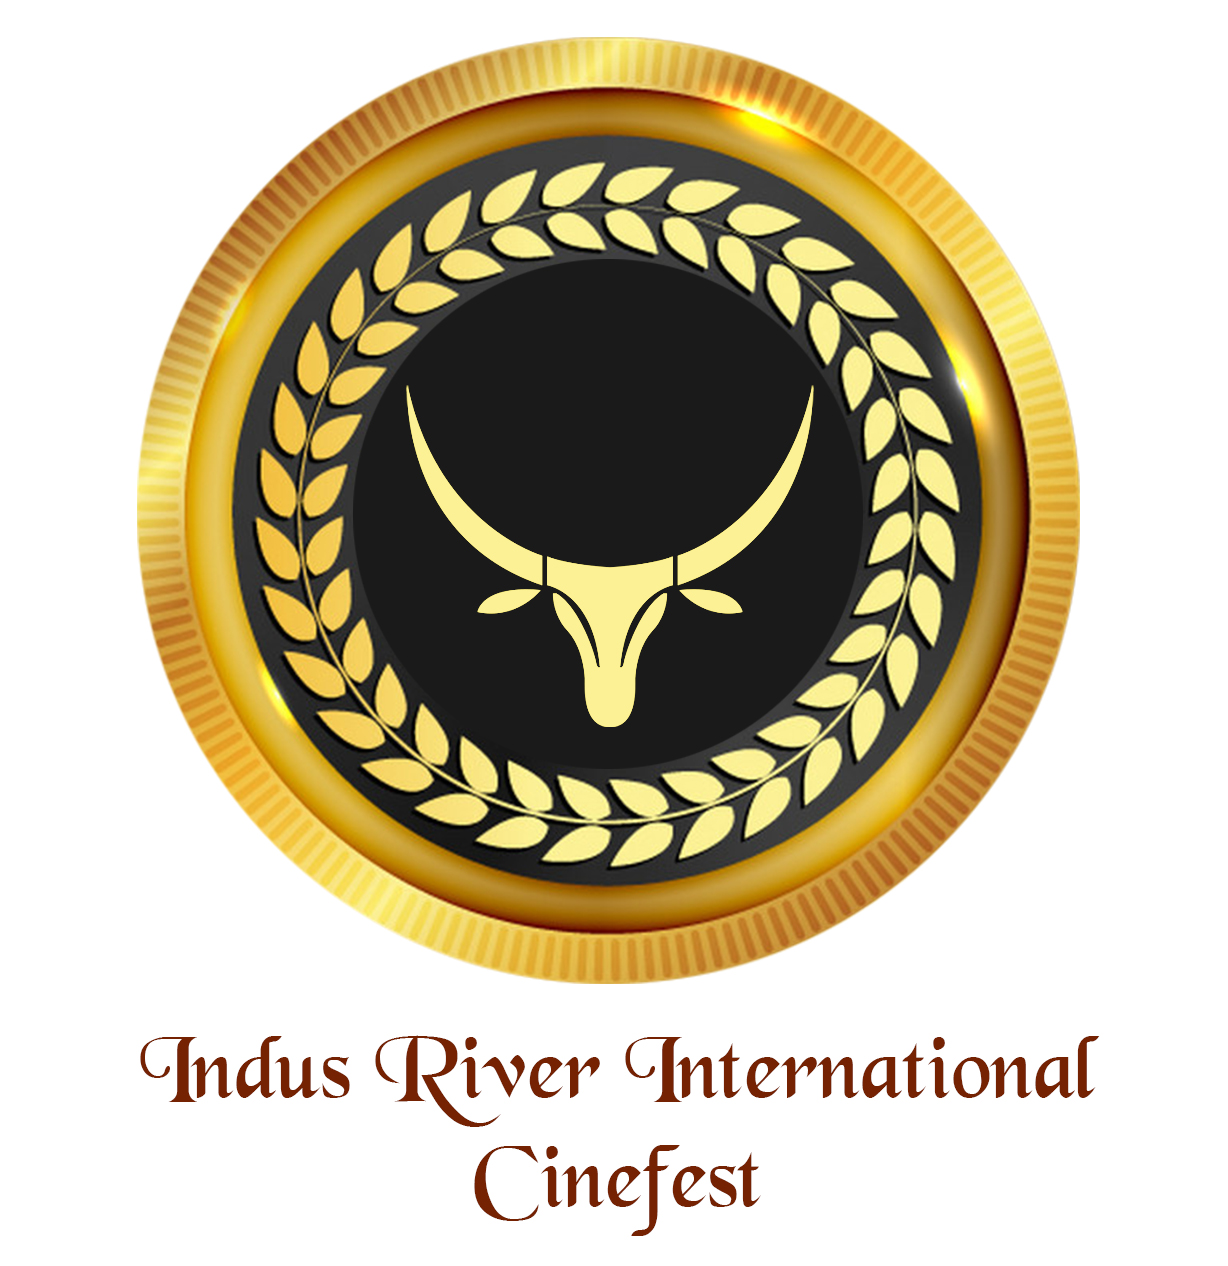 Indus River International Cinefest